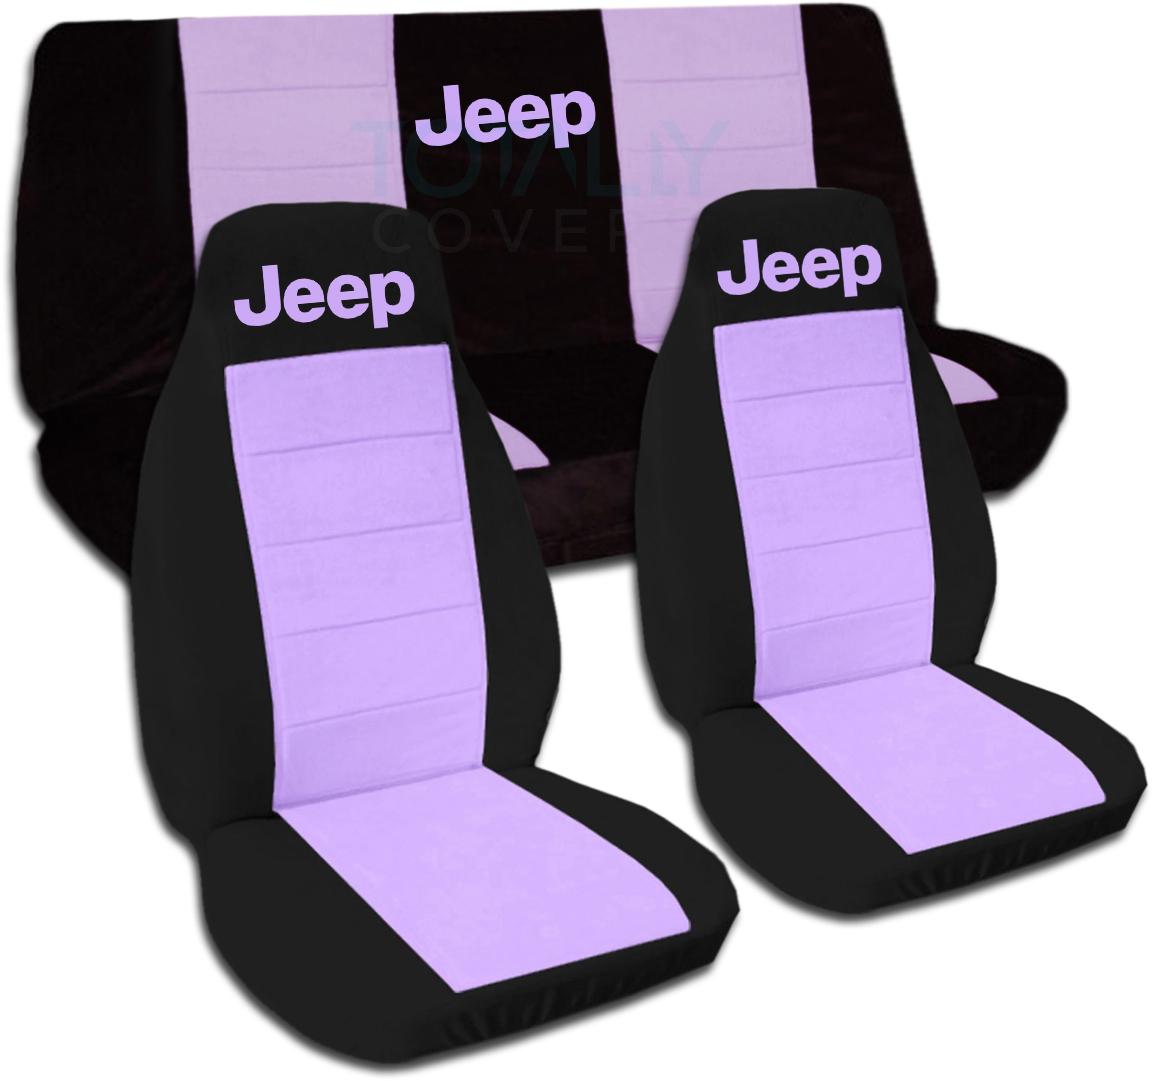 jeep wrangler yj tj jk 1987 2017 two tone seat covers w logo full set front rear ebay. Black Bedroom Furniture Sets. Home Design Ideas